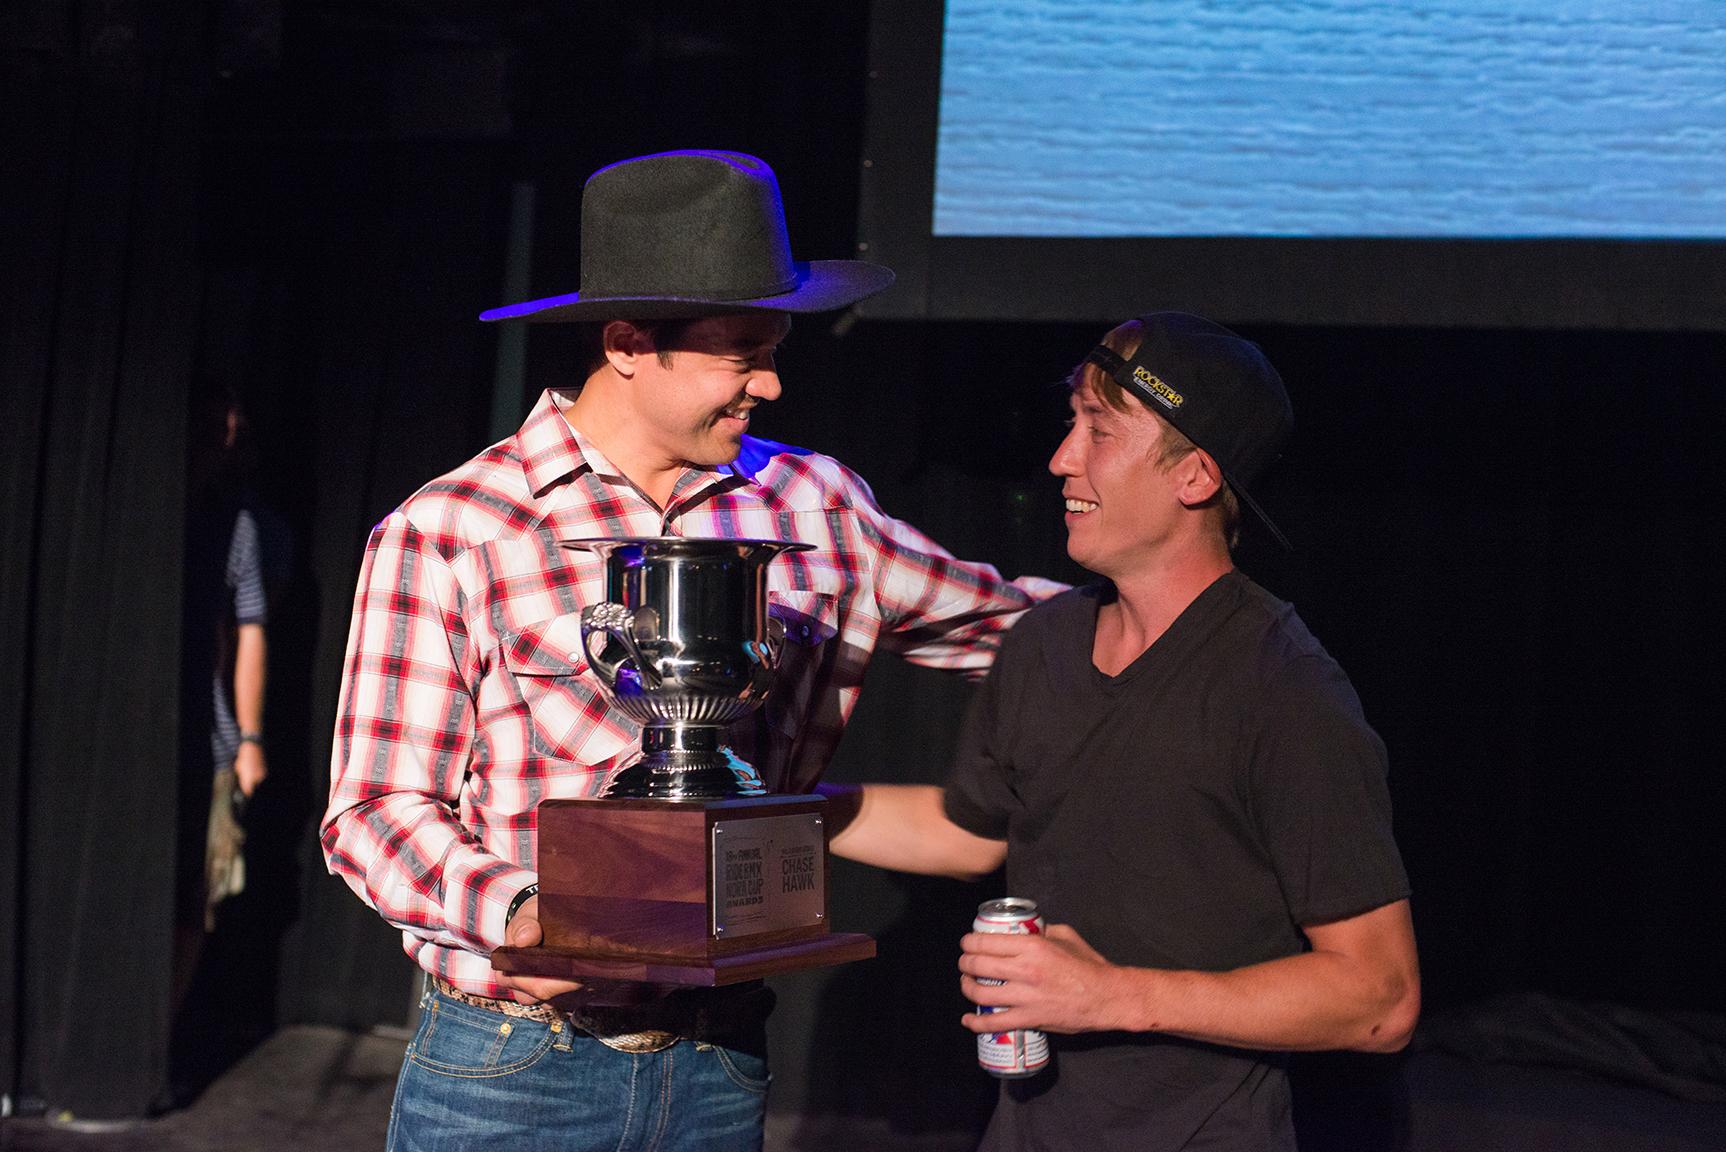 NORA Cup awards